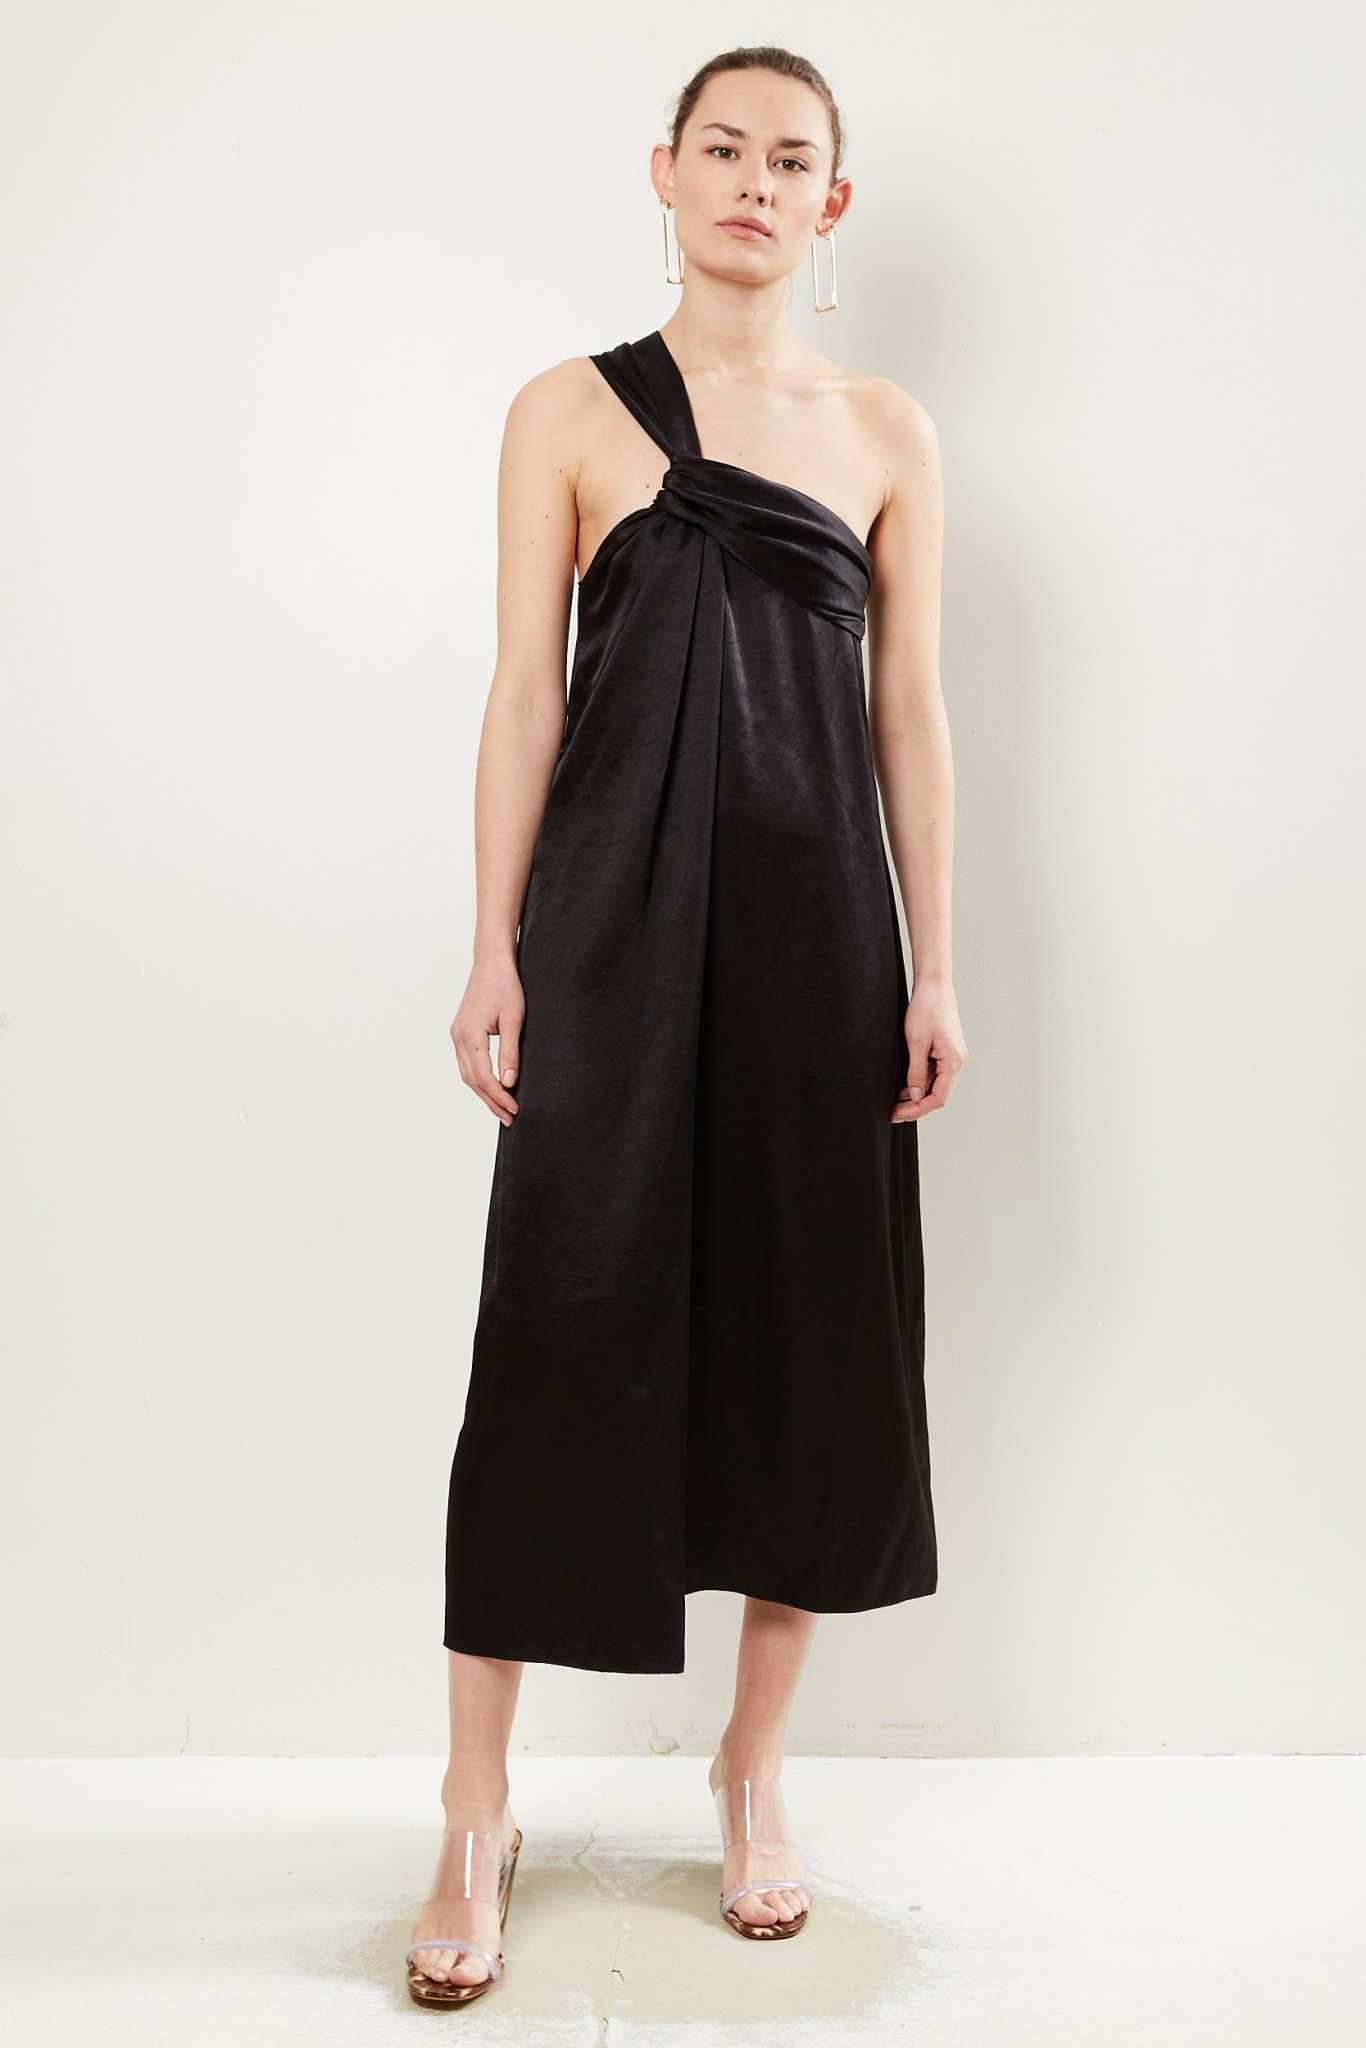 Nanushka - Zena washed satin dress black